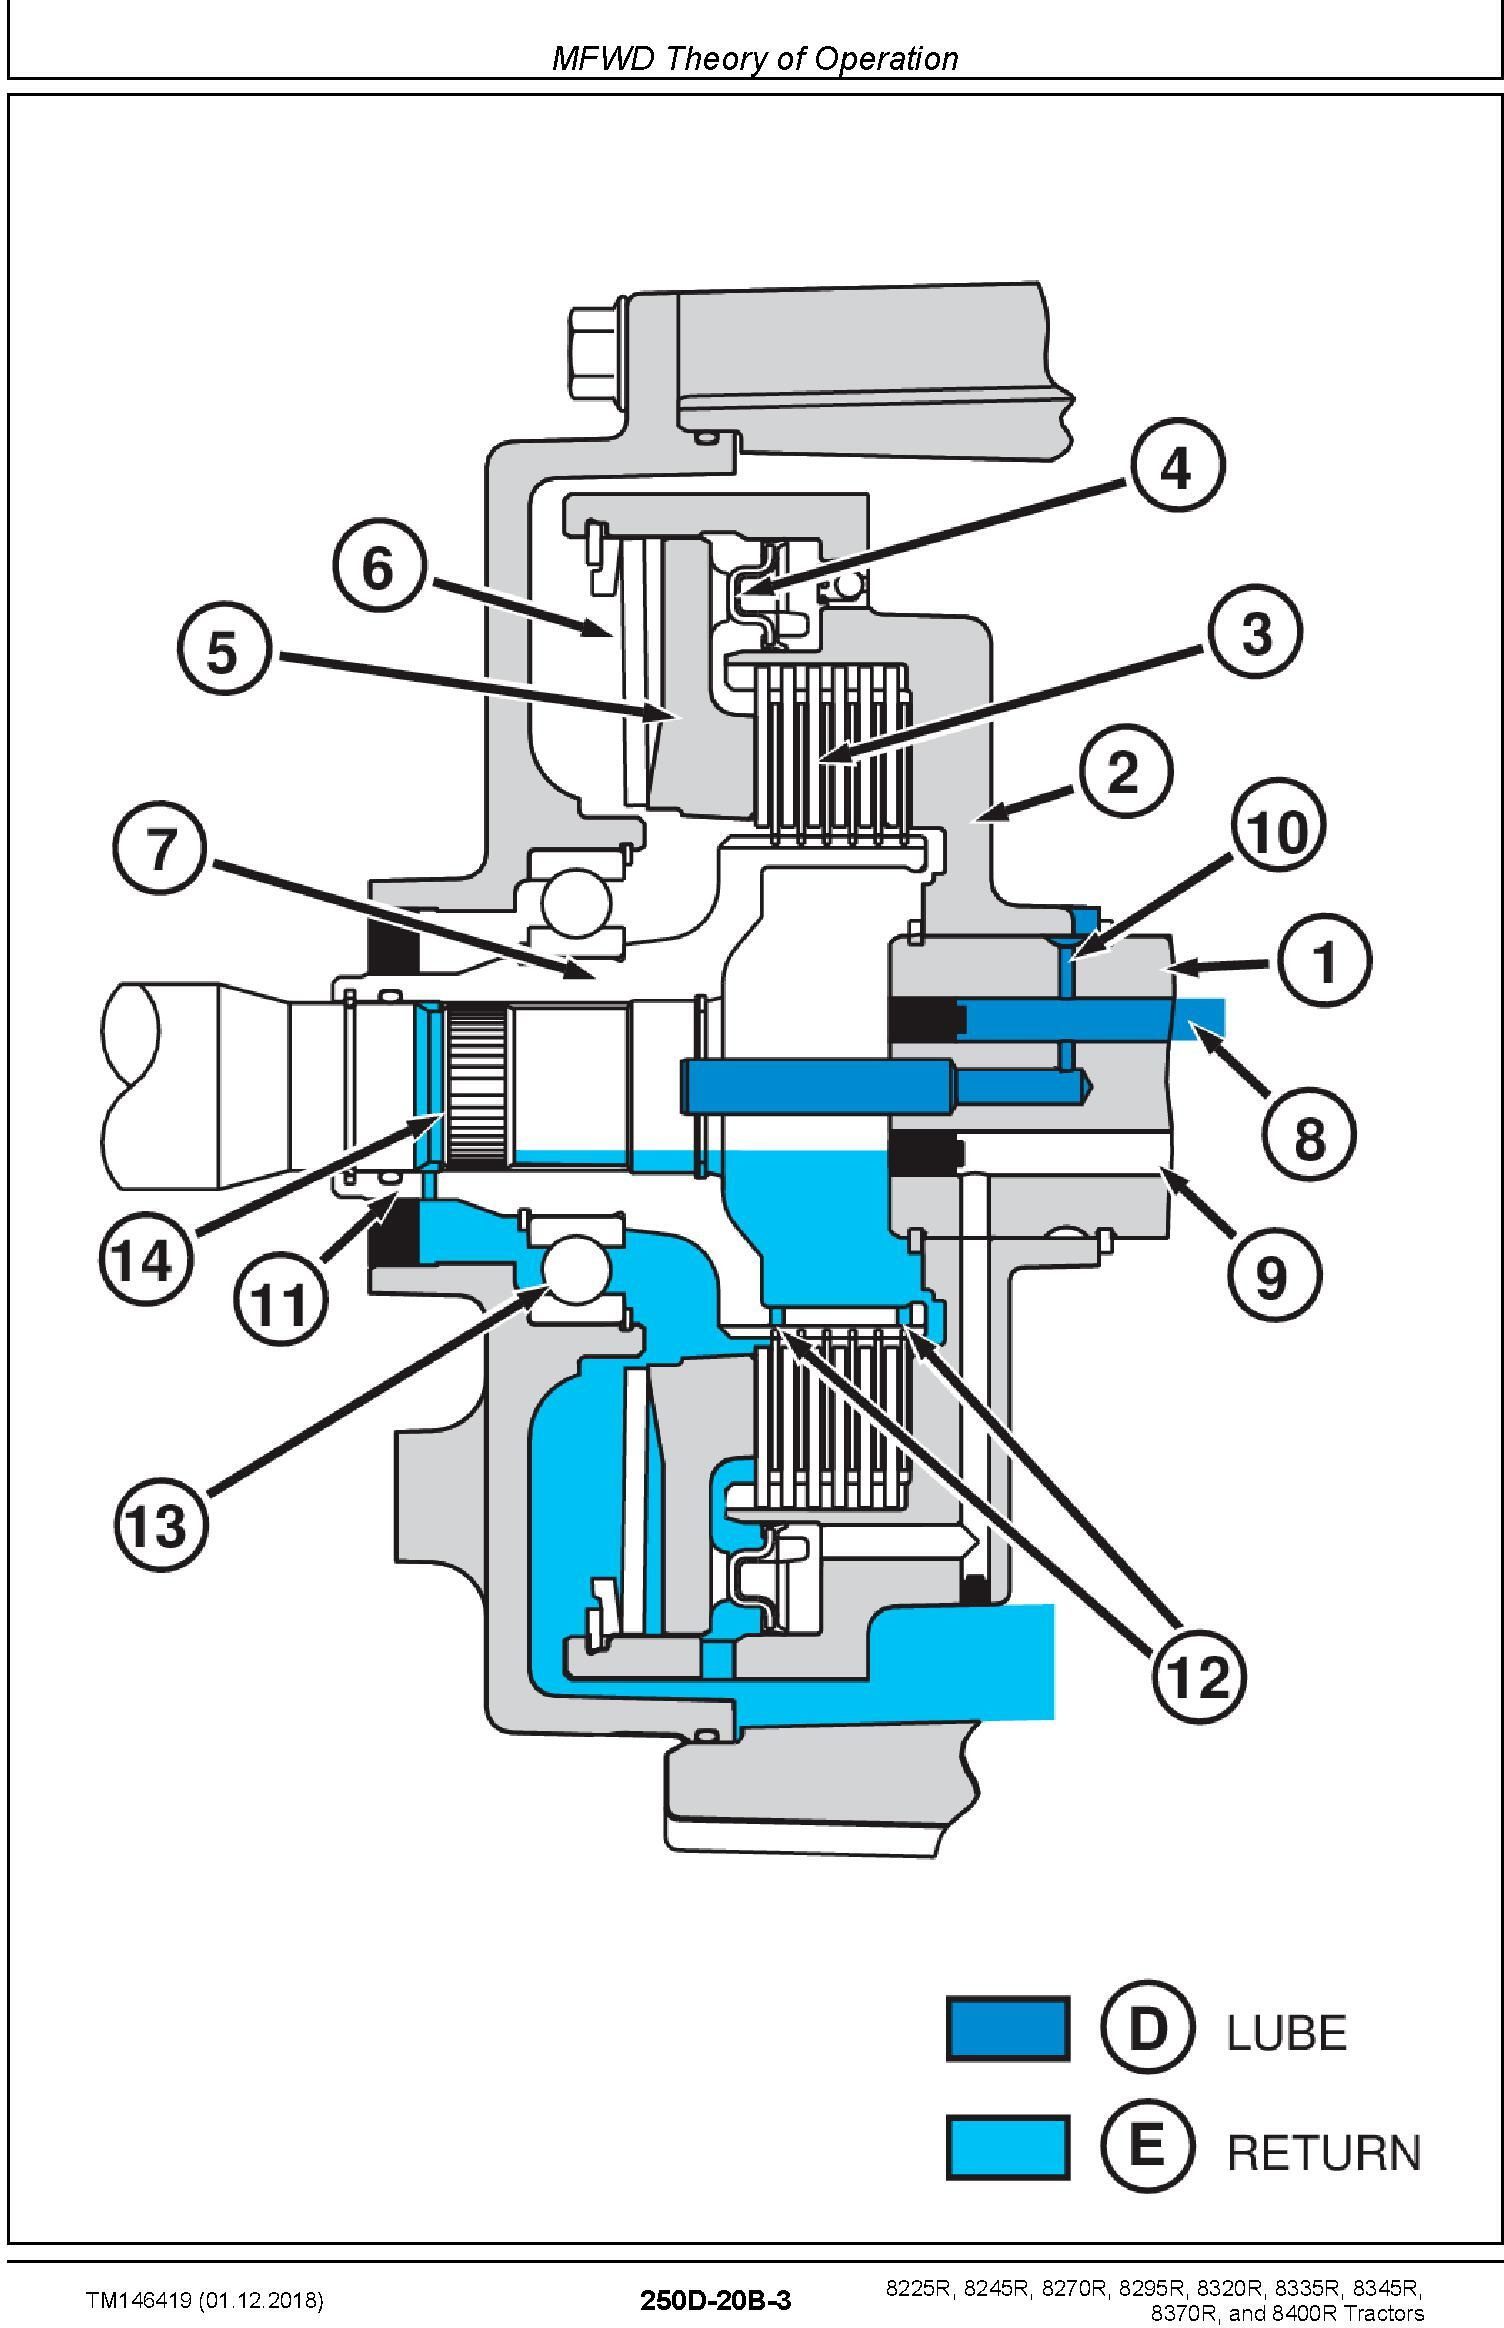 John Deere 8225R 8245R 8270R 8295R 8320R 8335R 8345R 8370R 8400R Tractors Diagnostic Manual TM146419 - 3